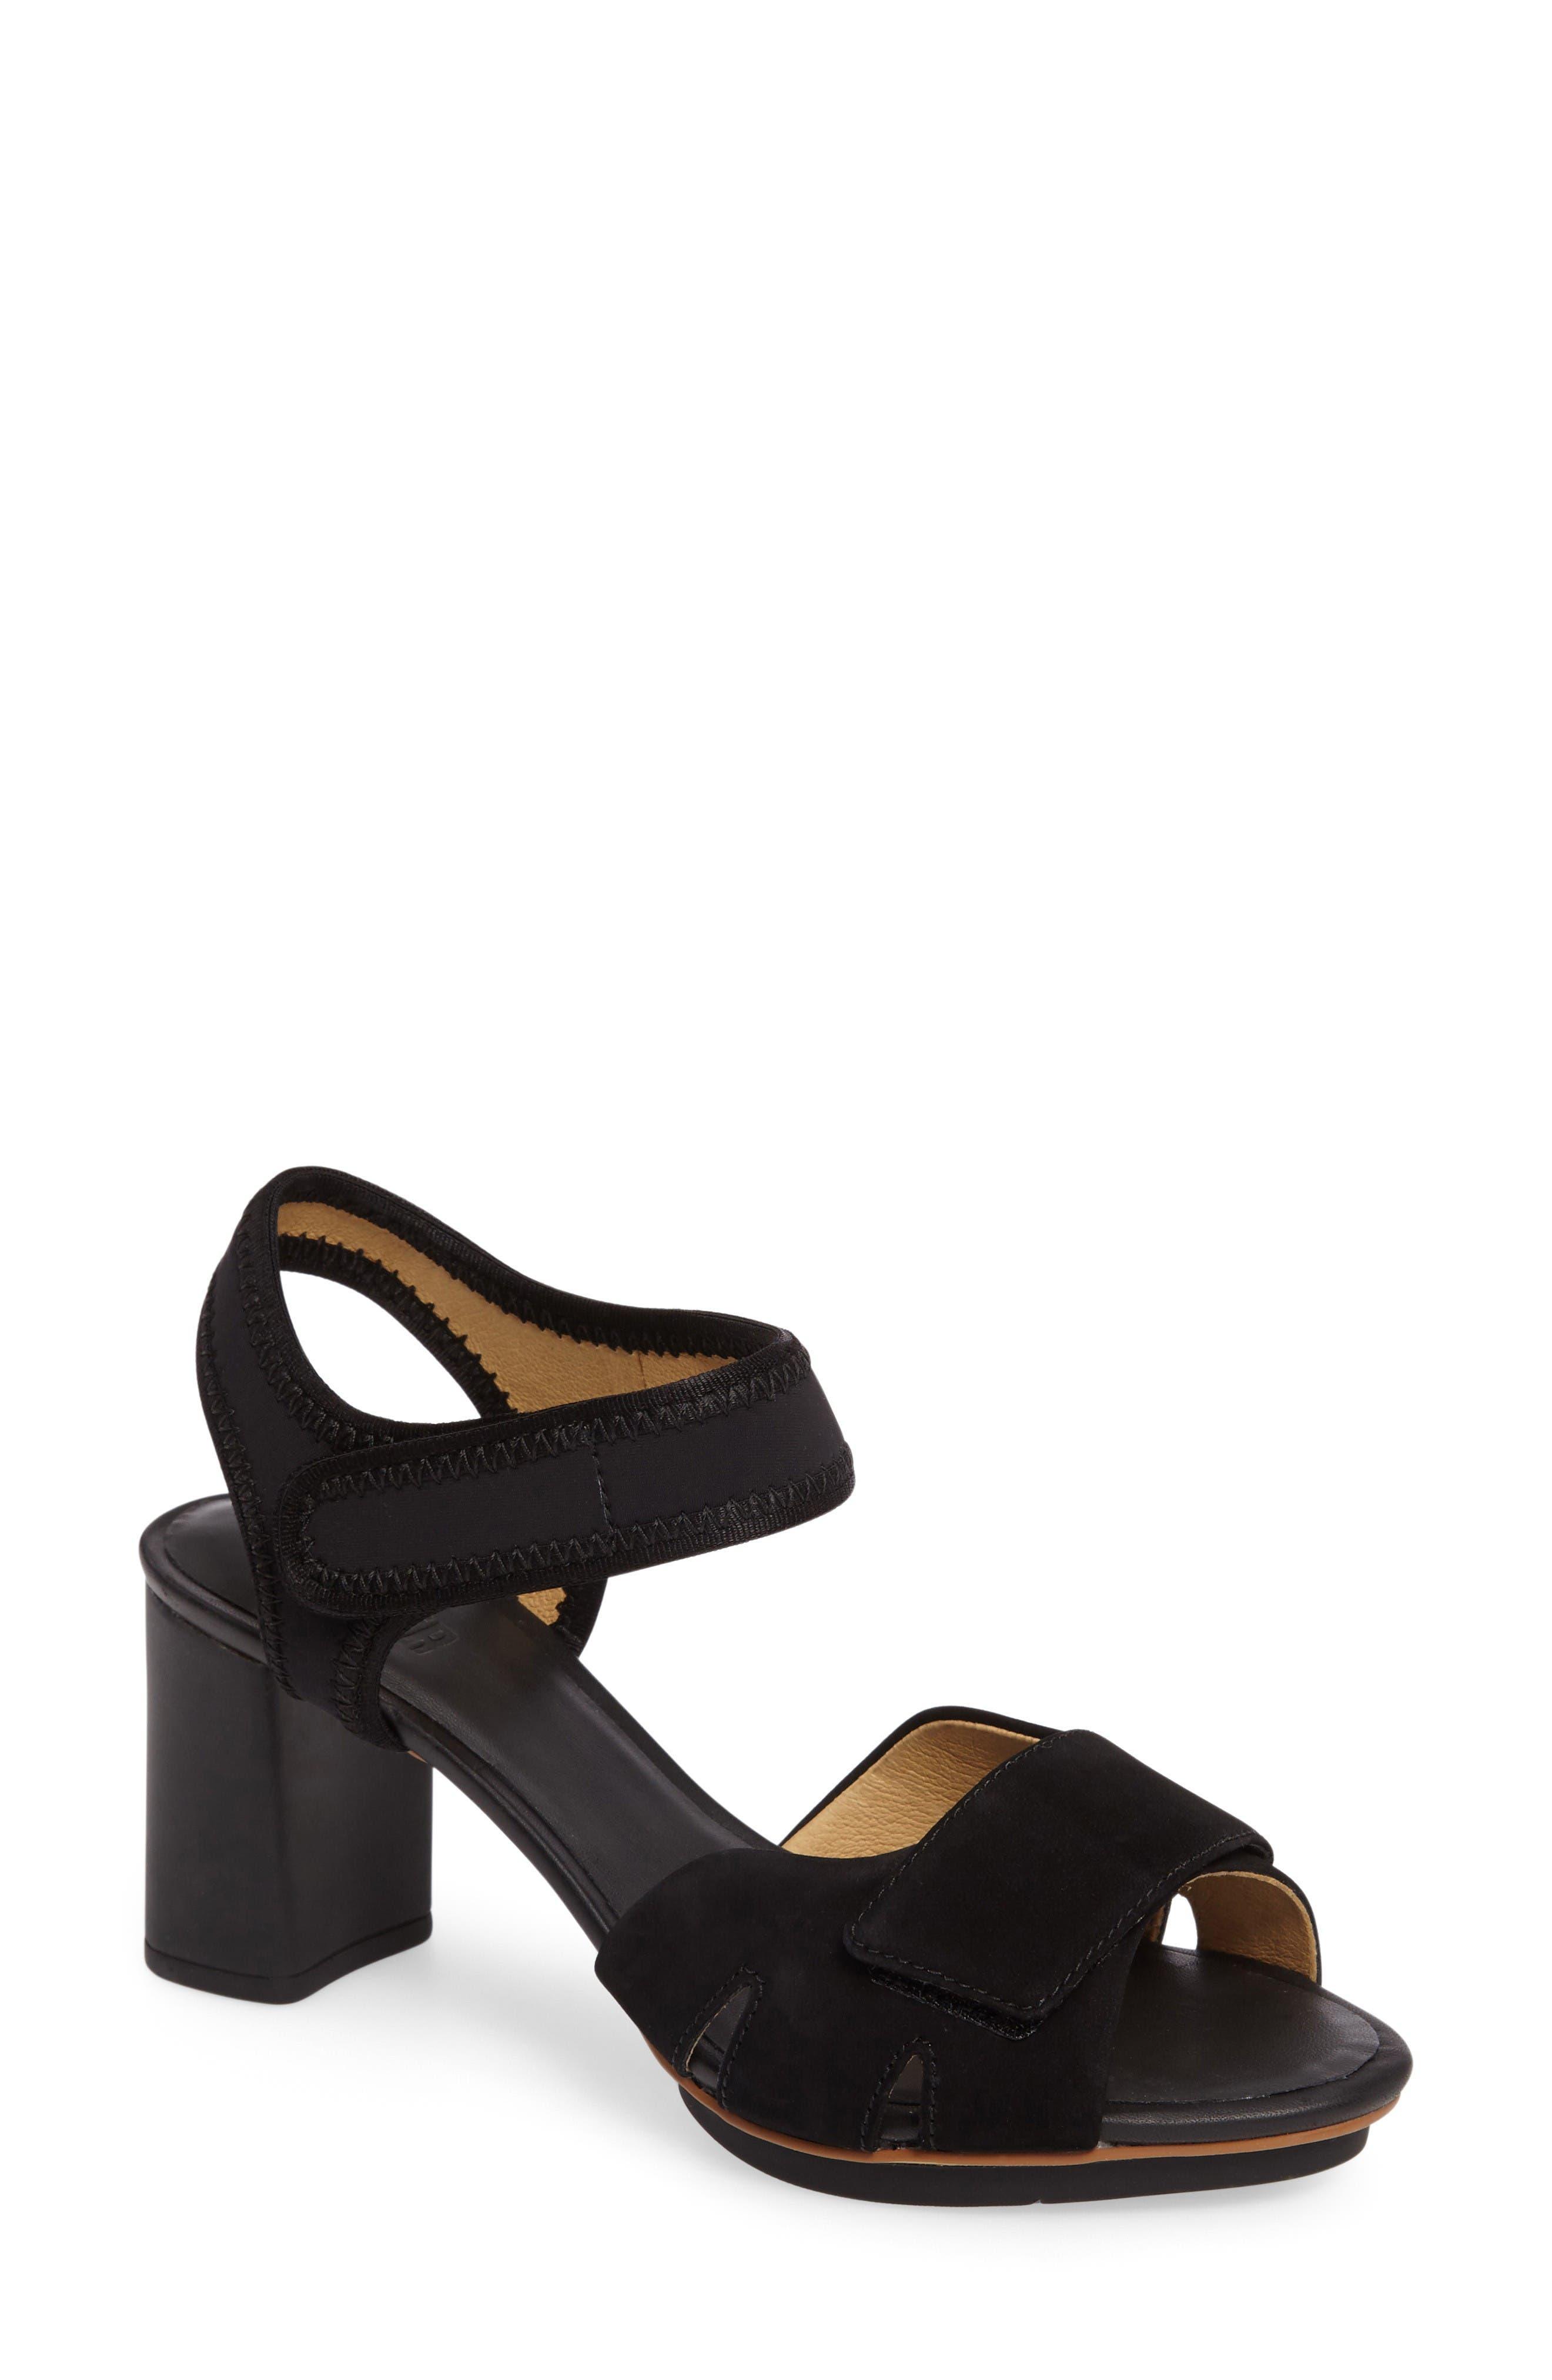 'Myriam' Ankle Strap Platform Sandal,                             Main thumbnail 1, color,                             Black/ Black Leather